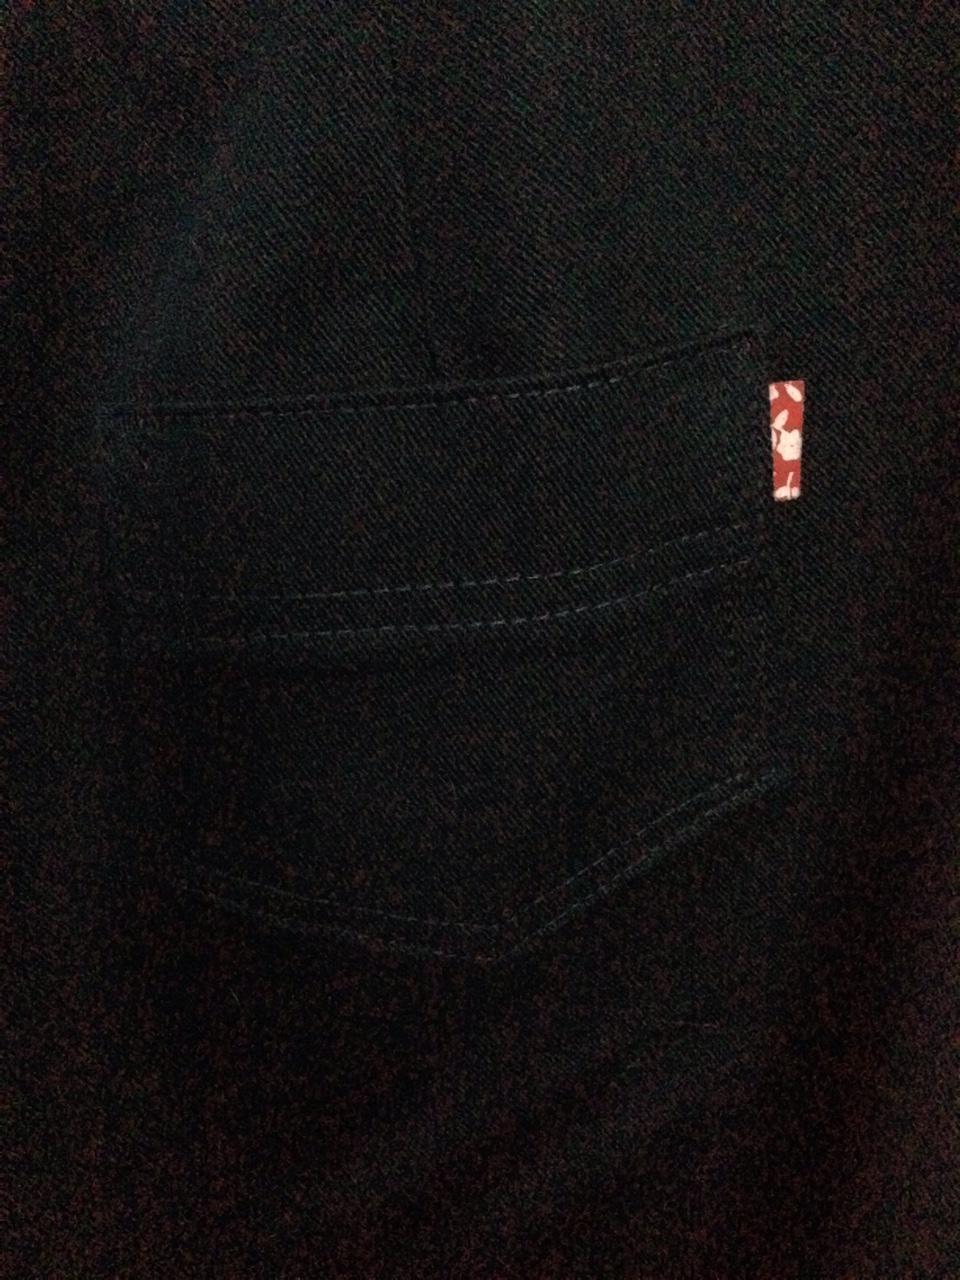 Rear pockets